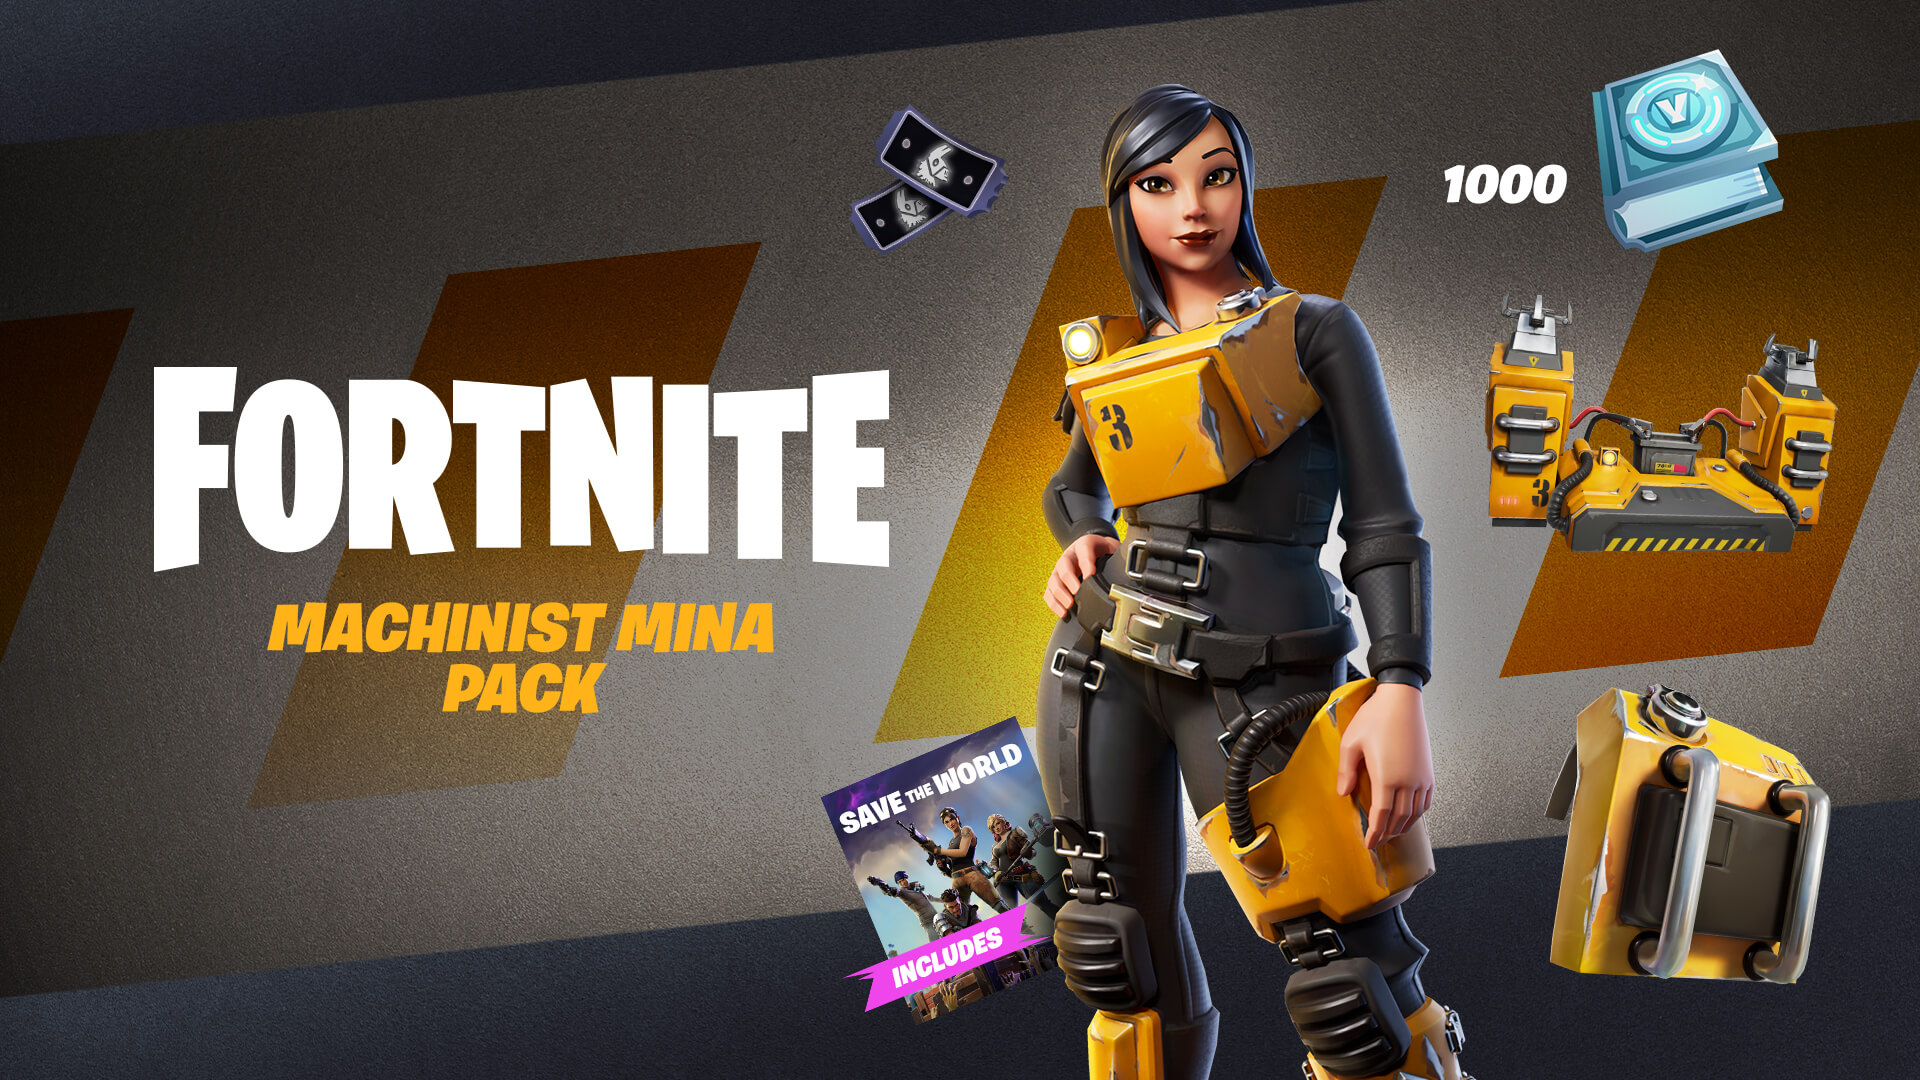 Fortnite Save the World Machinist Mina Pack EN